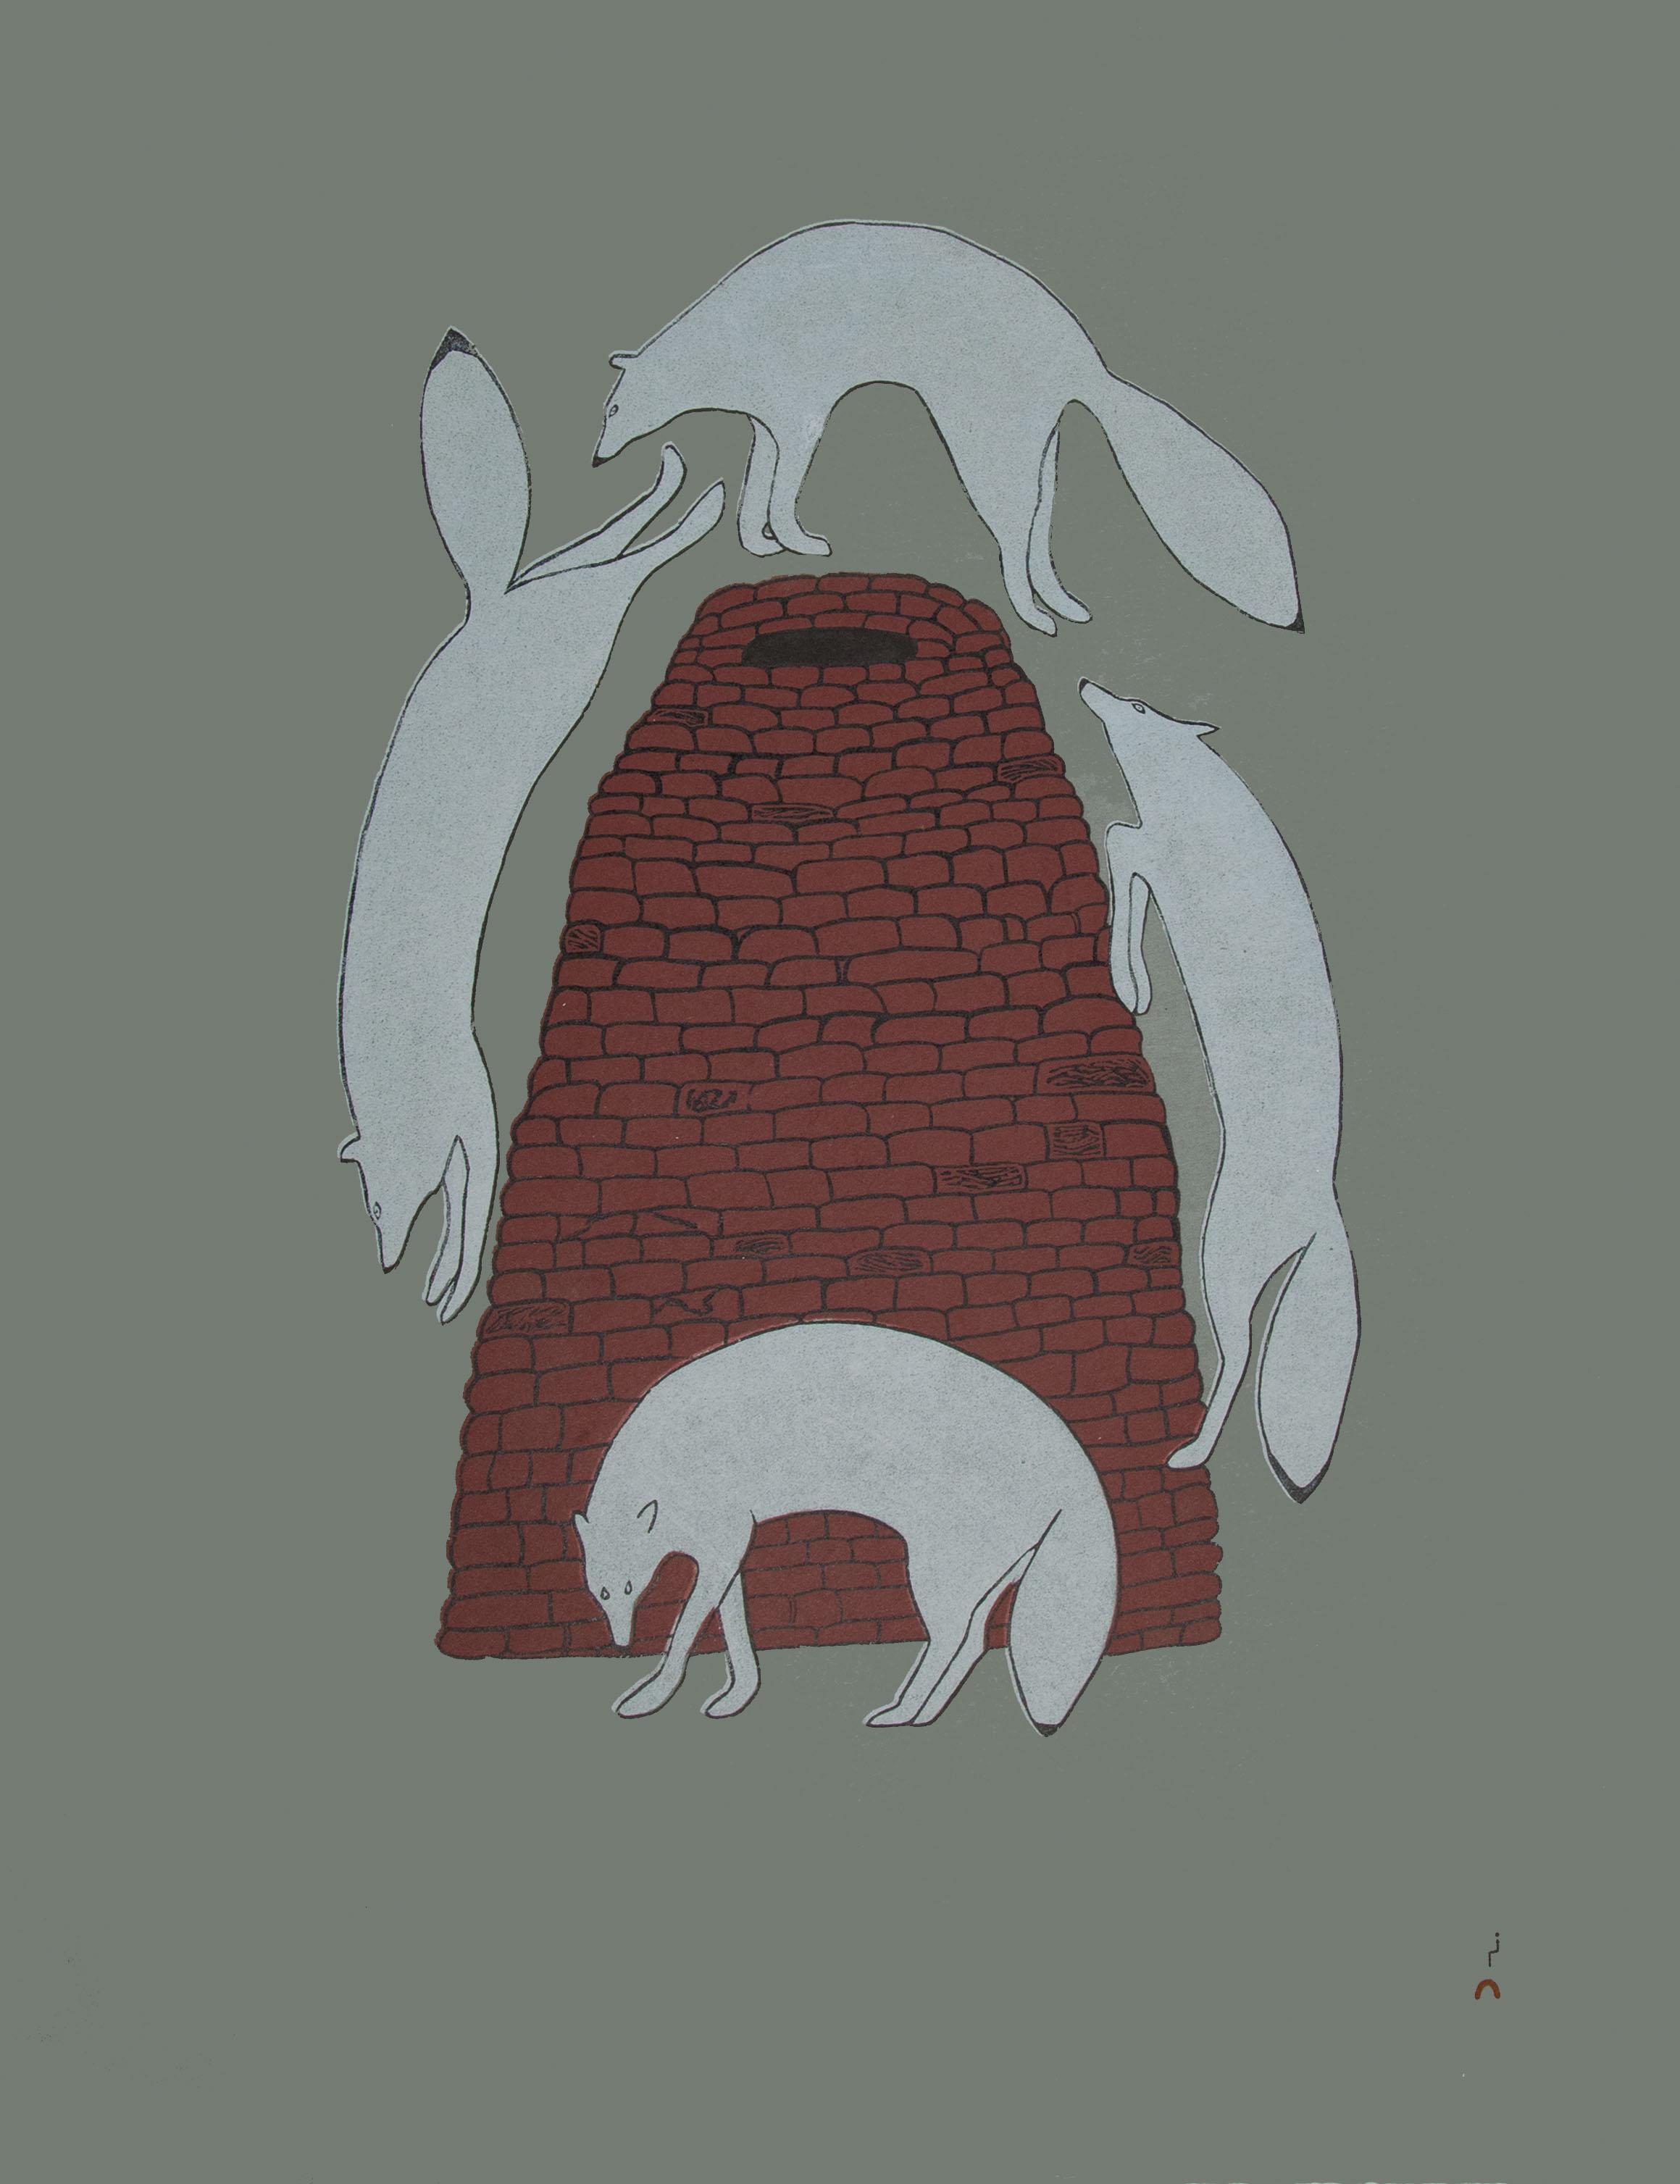 QUVIANAQTUK PUDLAT Sly Foxes Stonecut Printer: Cee Pootoogook 80 x 61 cm; 31 1/2 x 24 in. $640 US